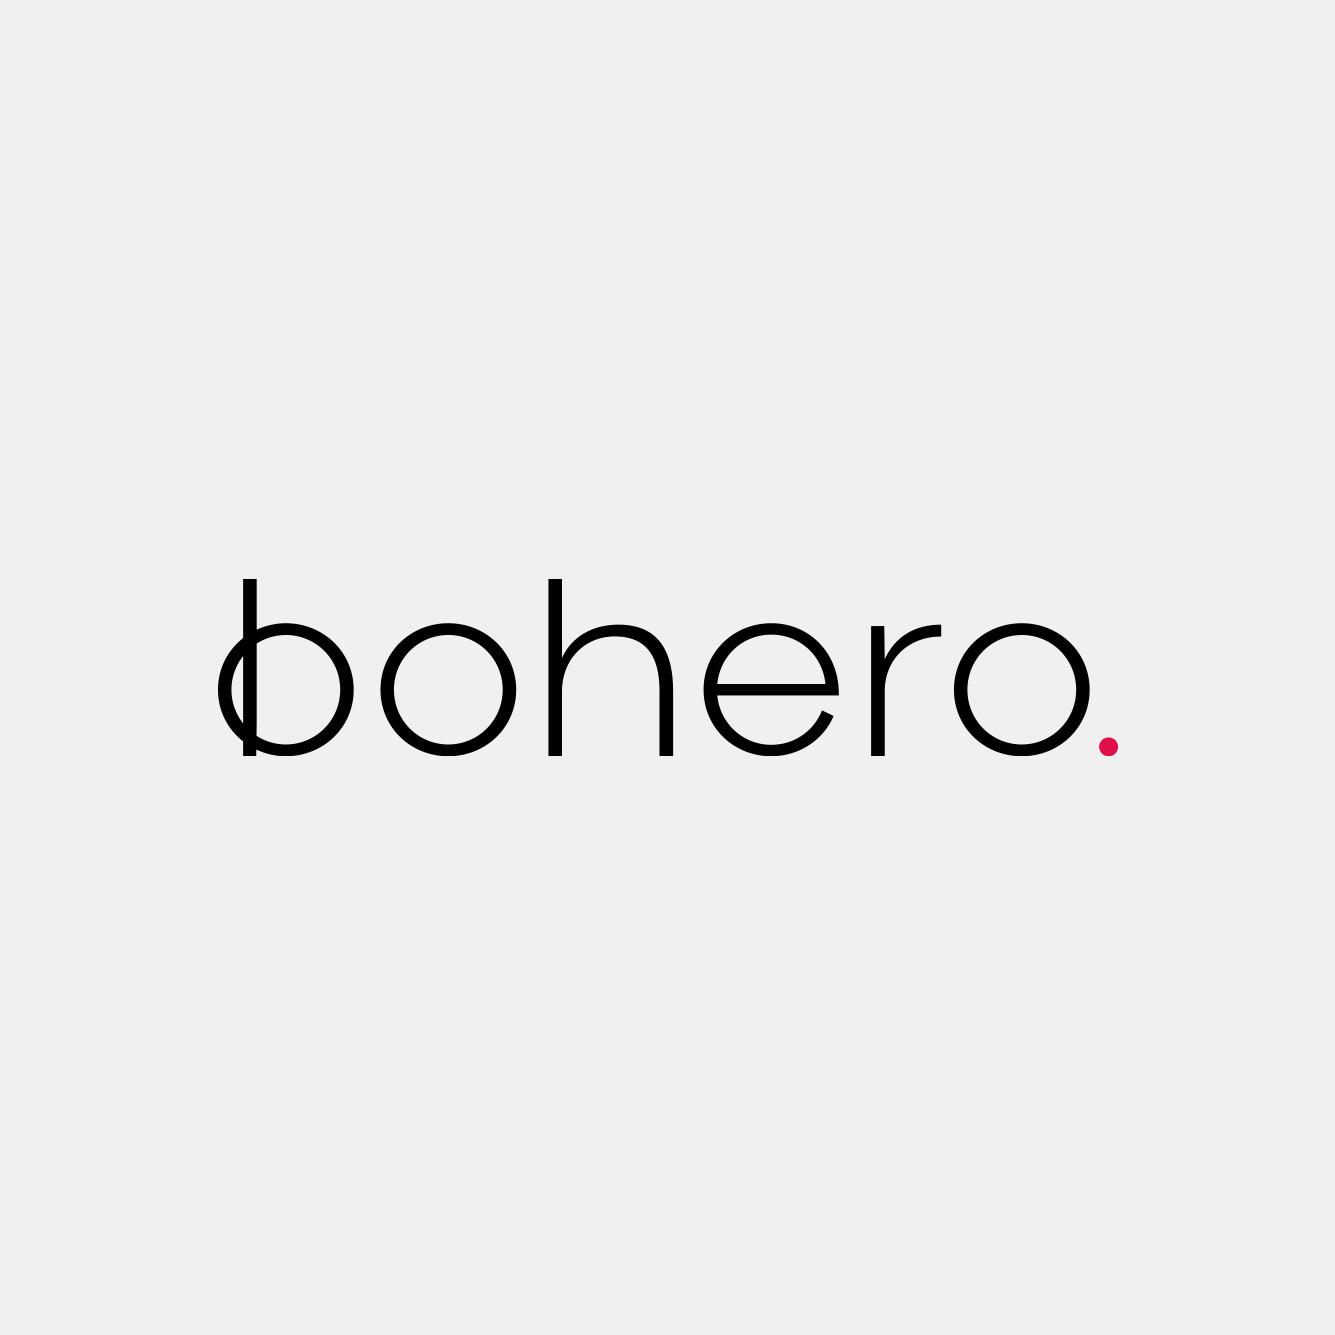 https://www.webatvantage.be/Repository/Projecten2019/Bohero/bohero-text-image.jpg